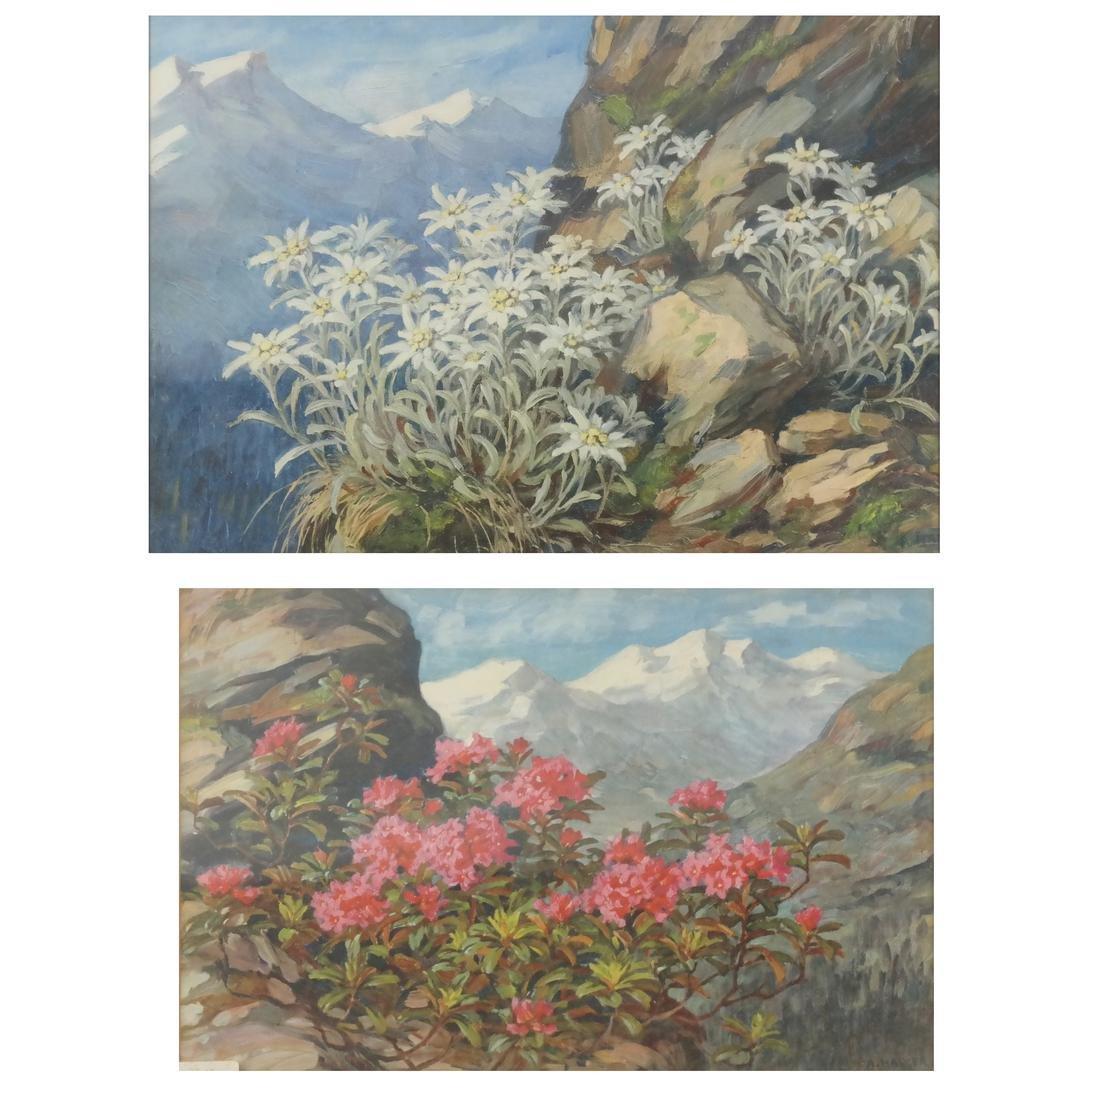 Two Anna Haller Works